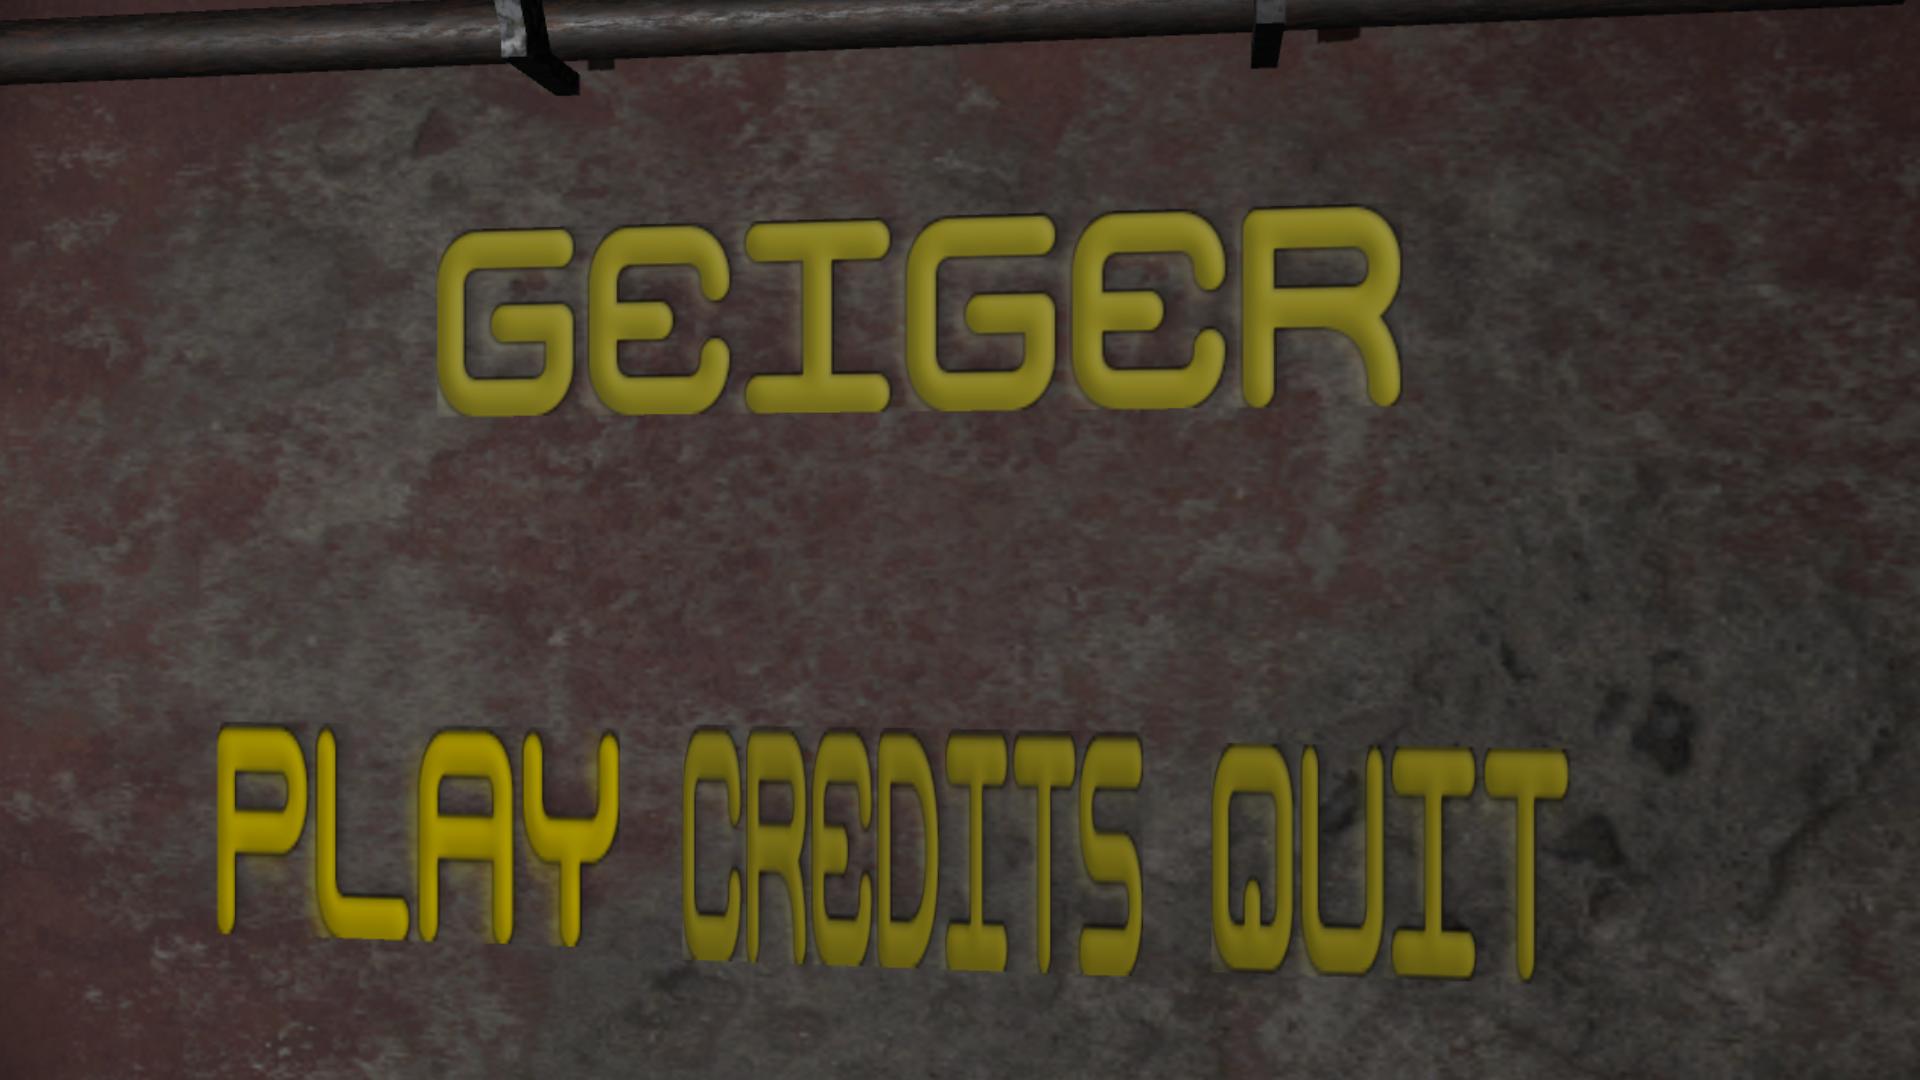 Geiger (Senior Project Game)